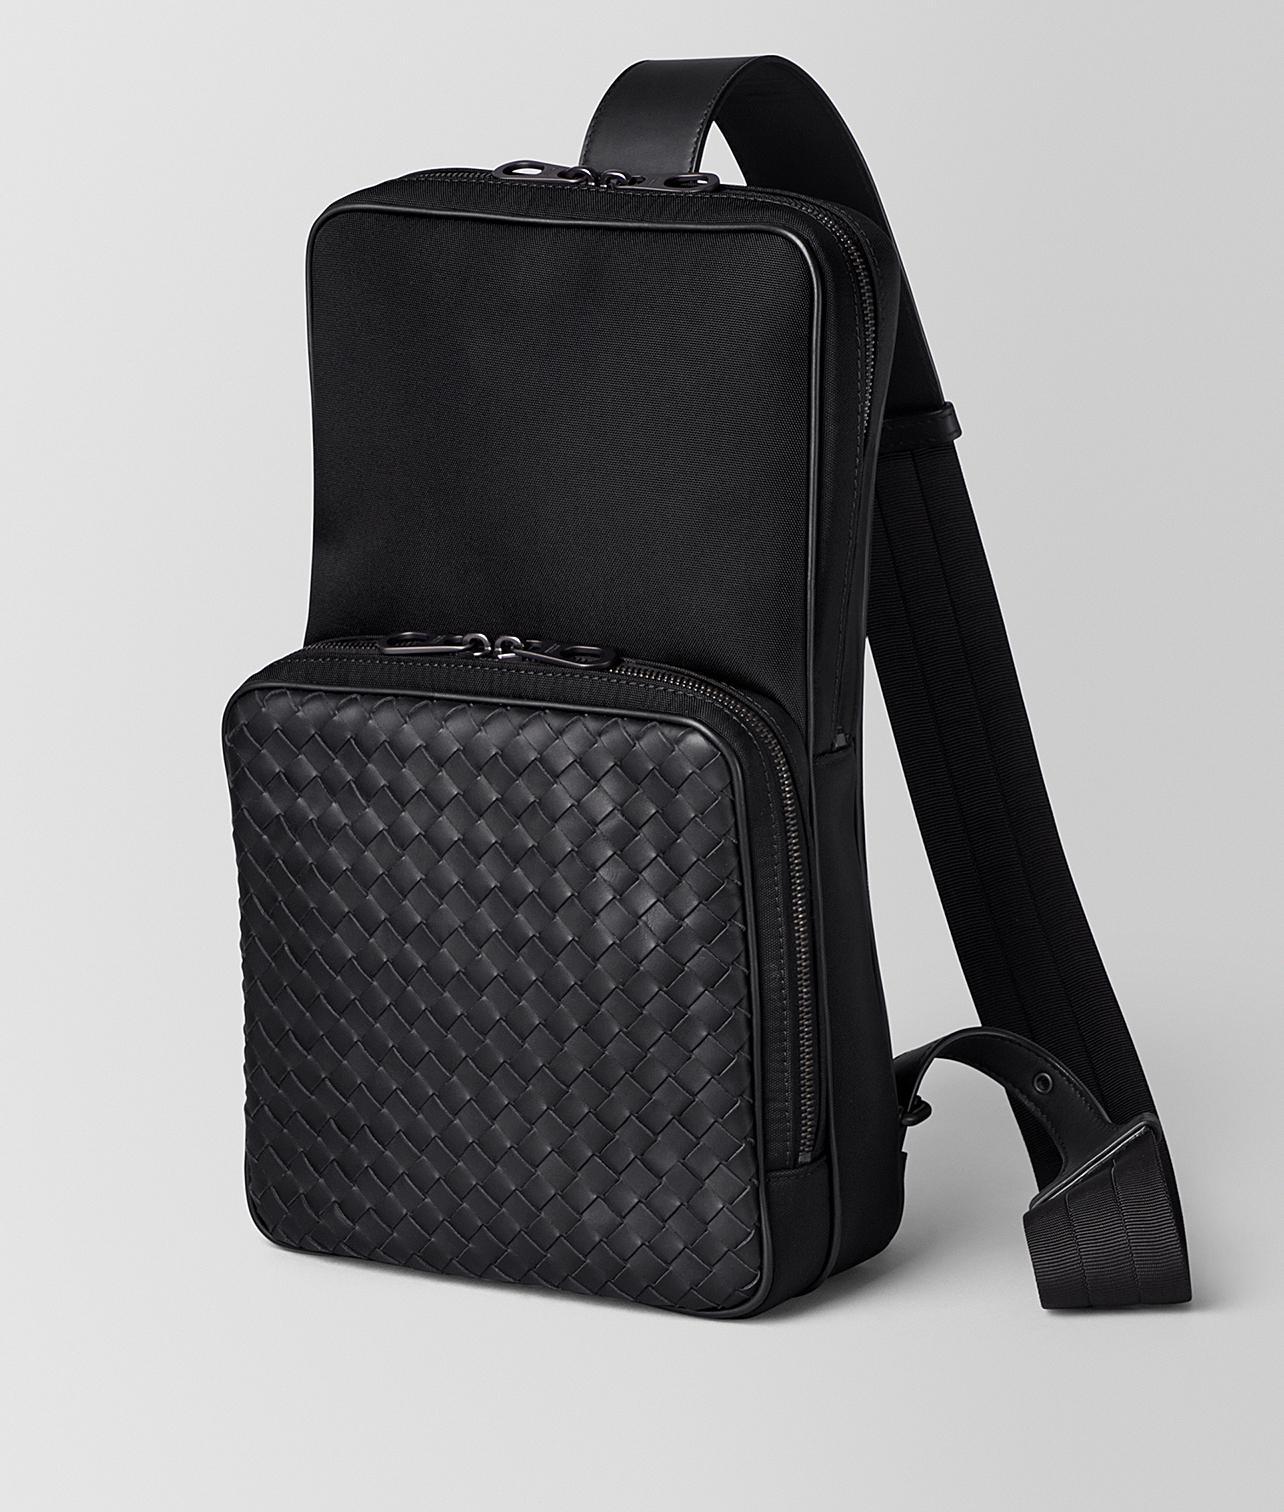 Lyst - Bottega Veneta Nero Hi-tech Canvas Sling Backpack in Black for Men 0697da3ccd